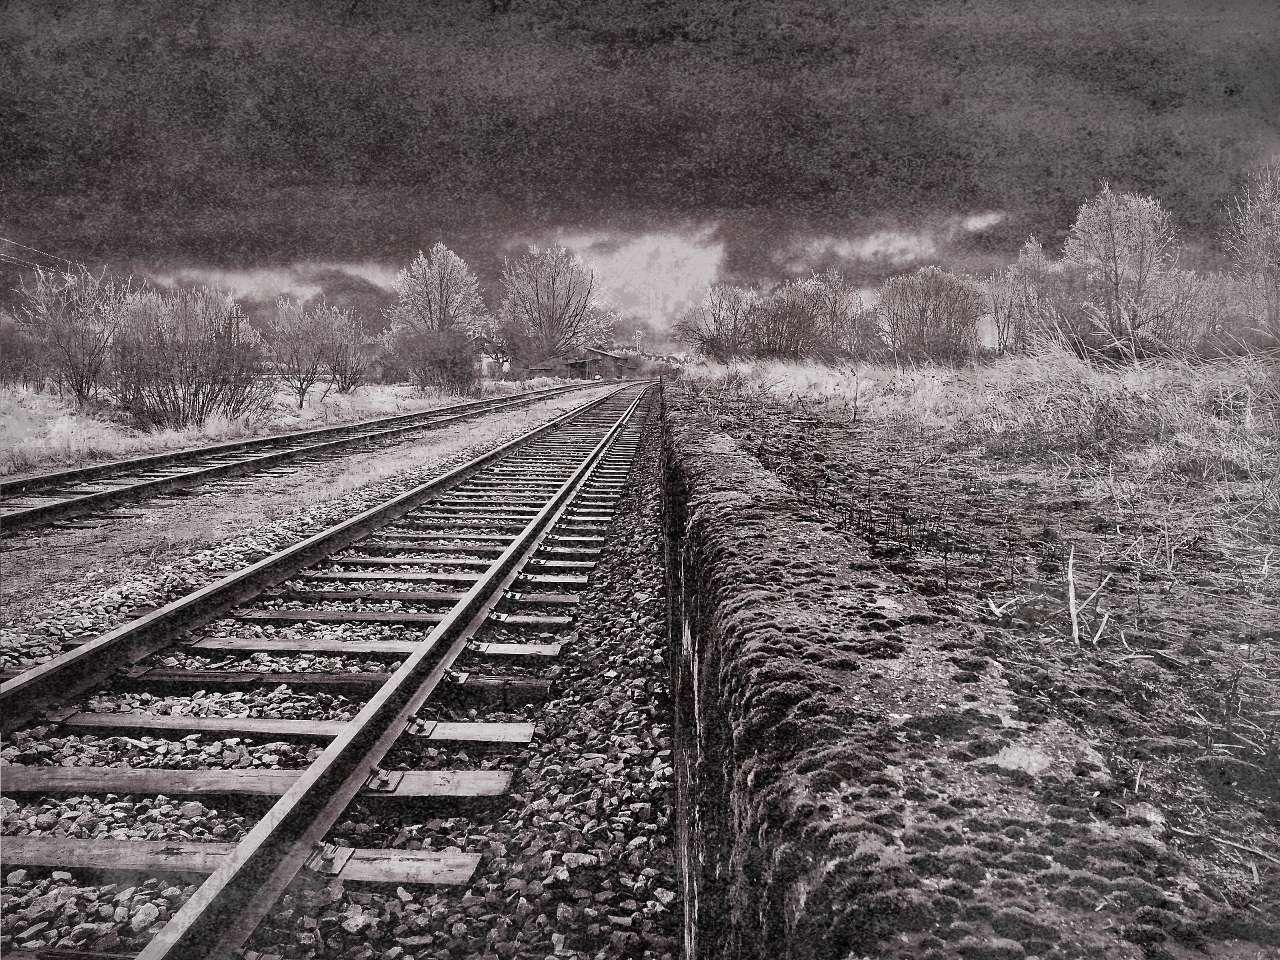 wp15-train-track